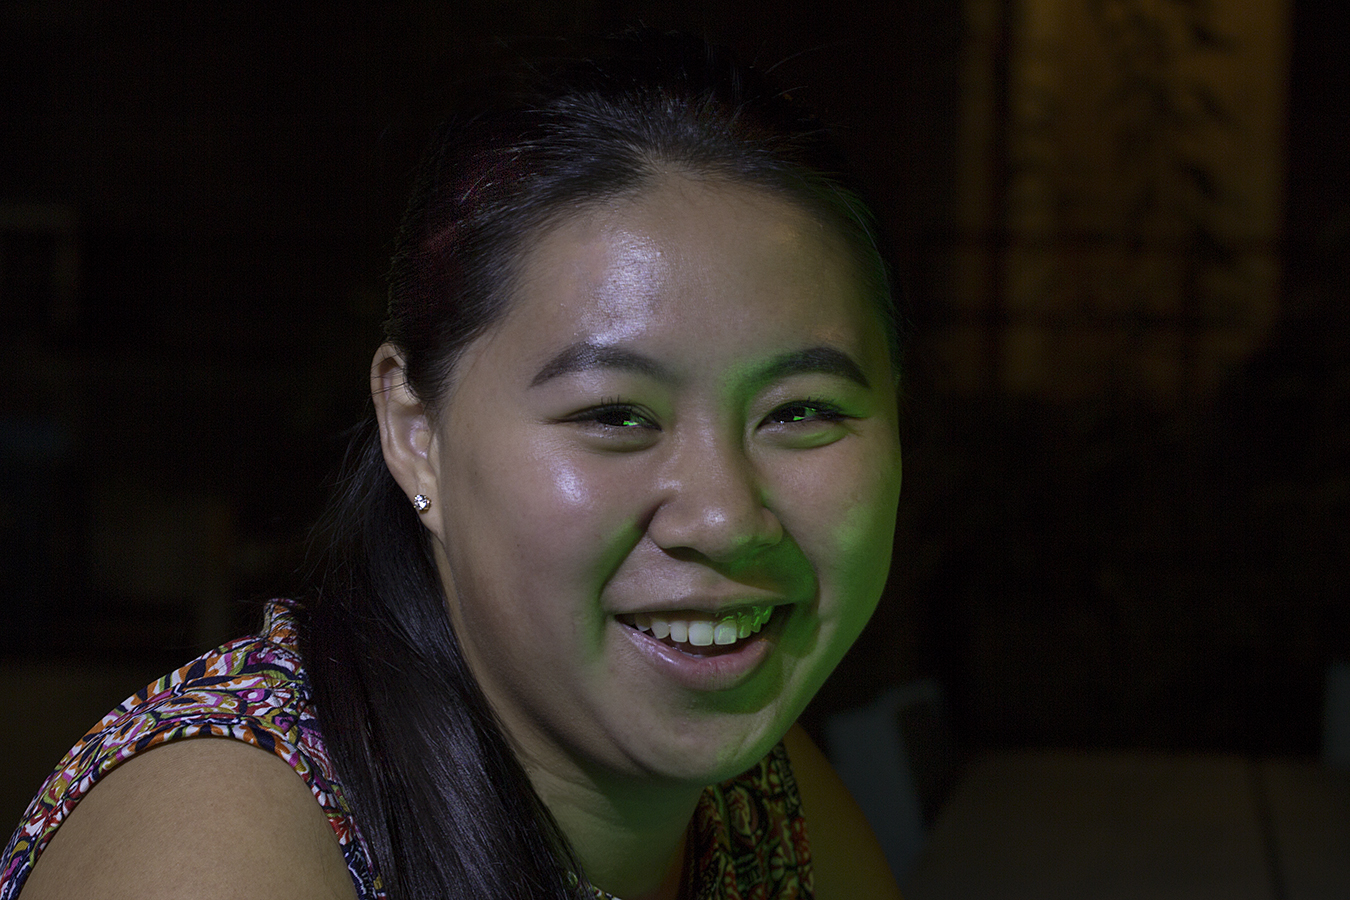 Matt_Garber_portrait_happiness_emotion_girl_night_green_light_joy_close_up